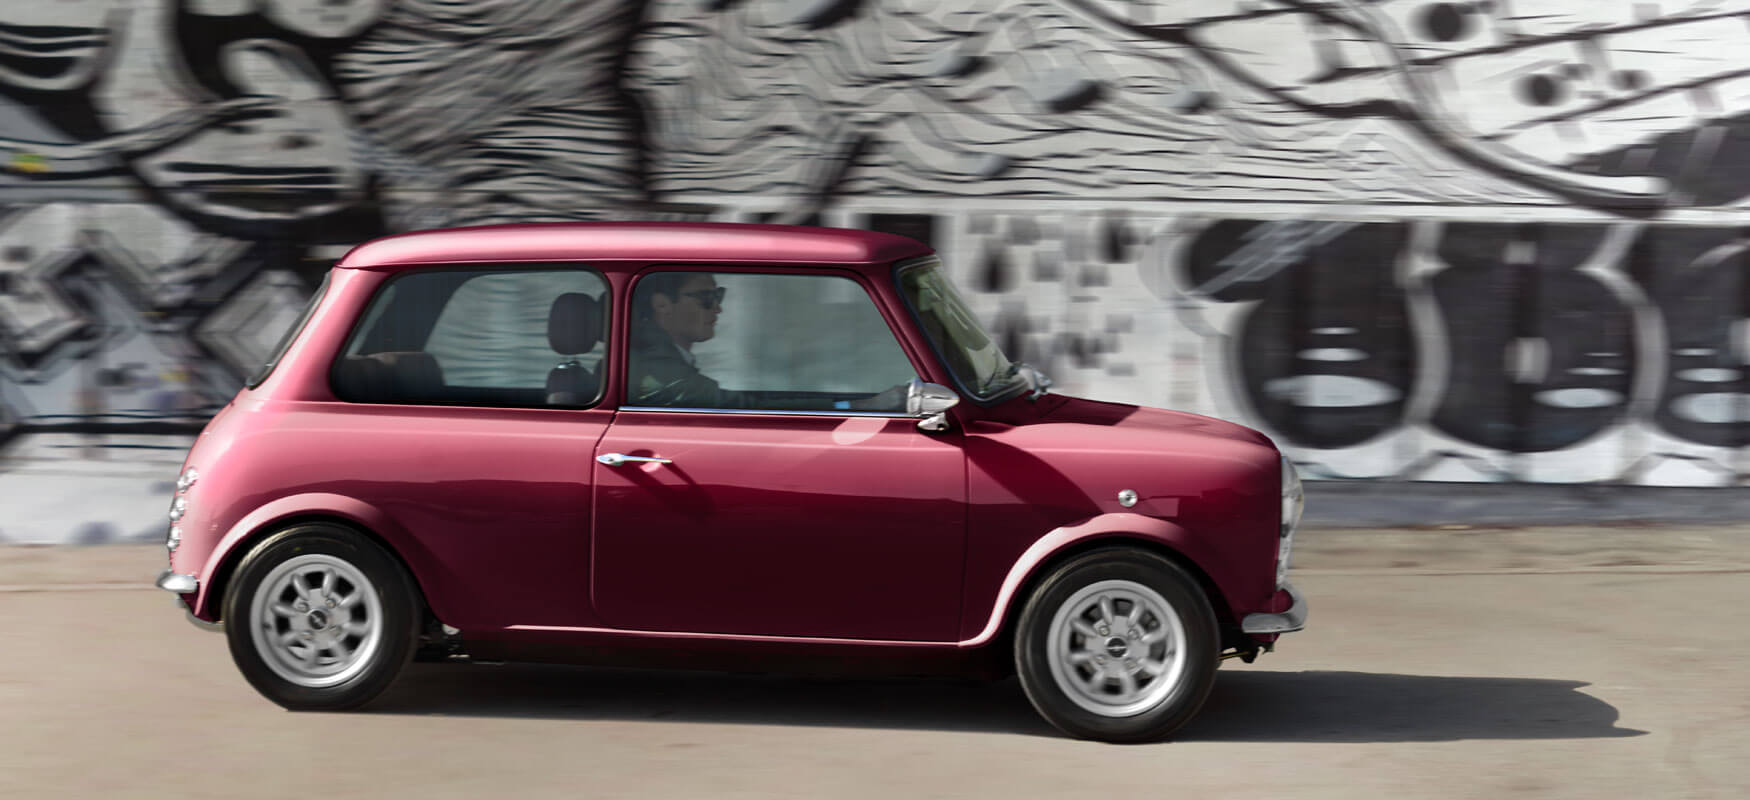 david brown automotive reimagines classic mini coopers automobile magazine. Black Bedroom Furniture Sets. Home Design Ideas